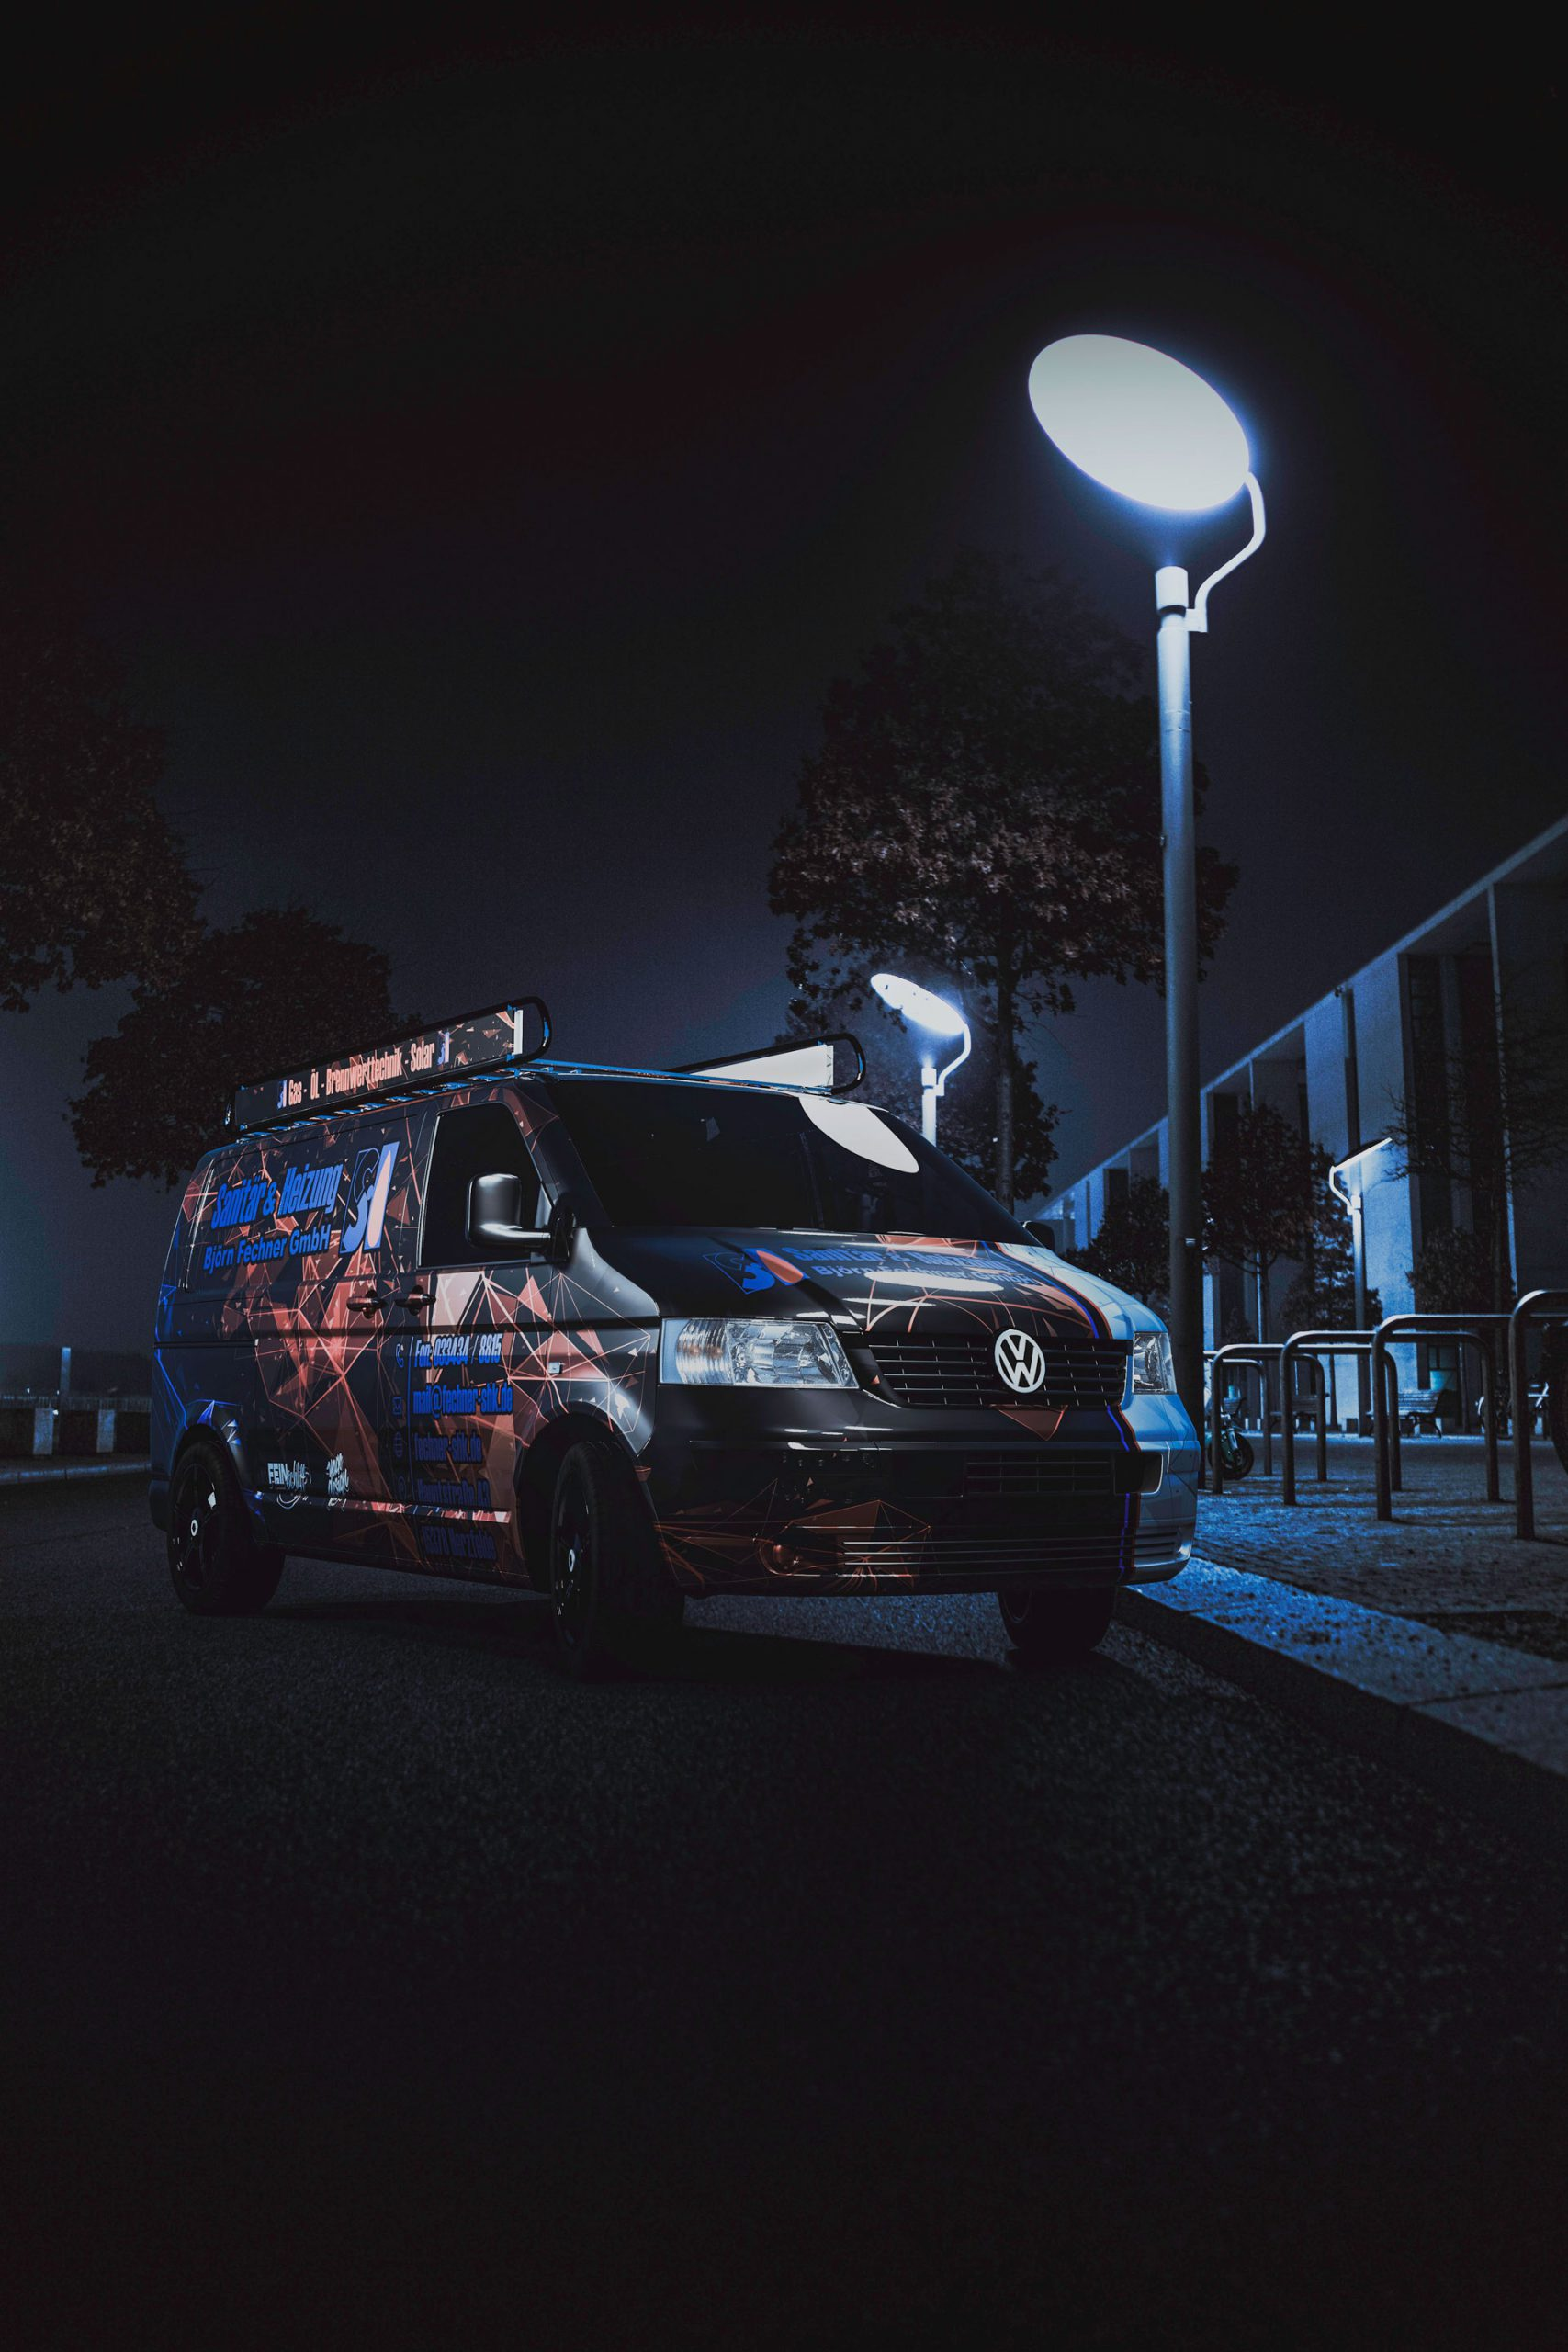 VW_T5_vV2